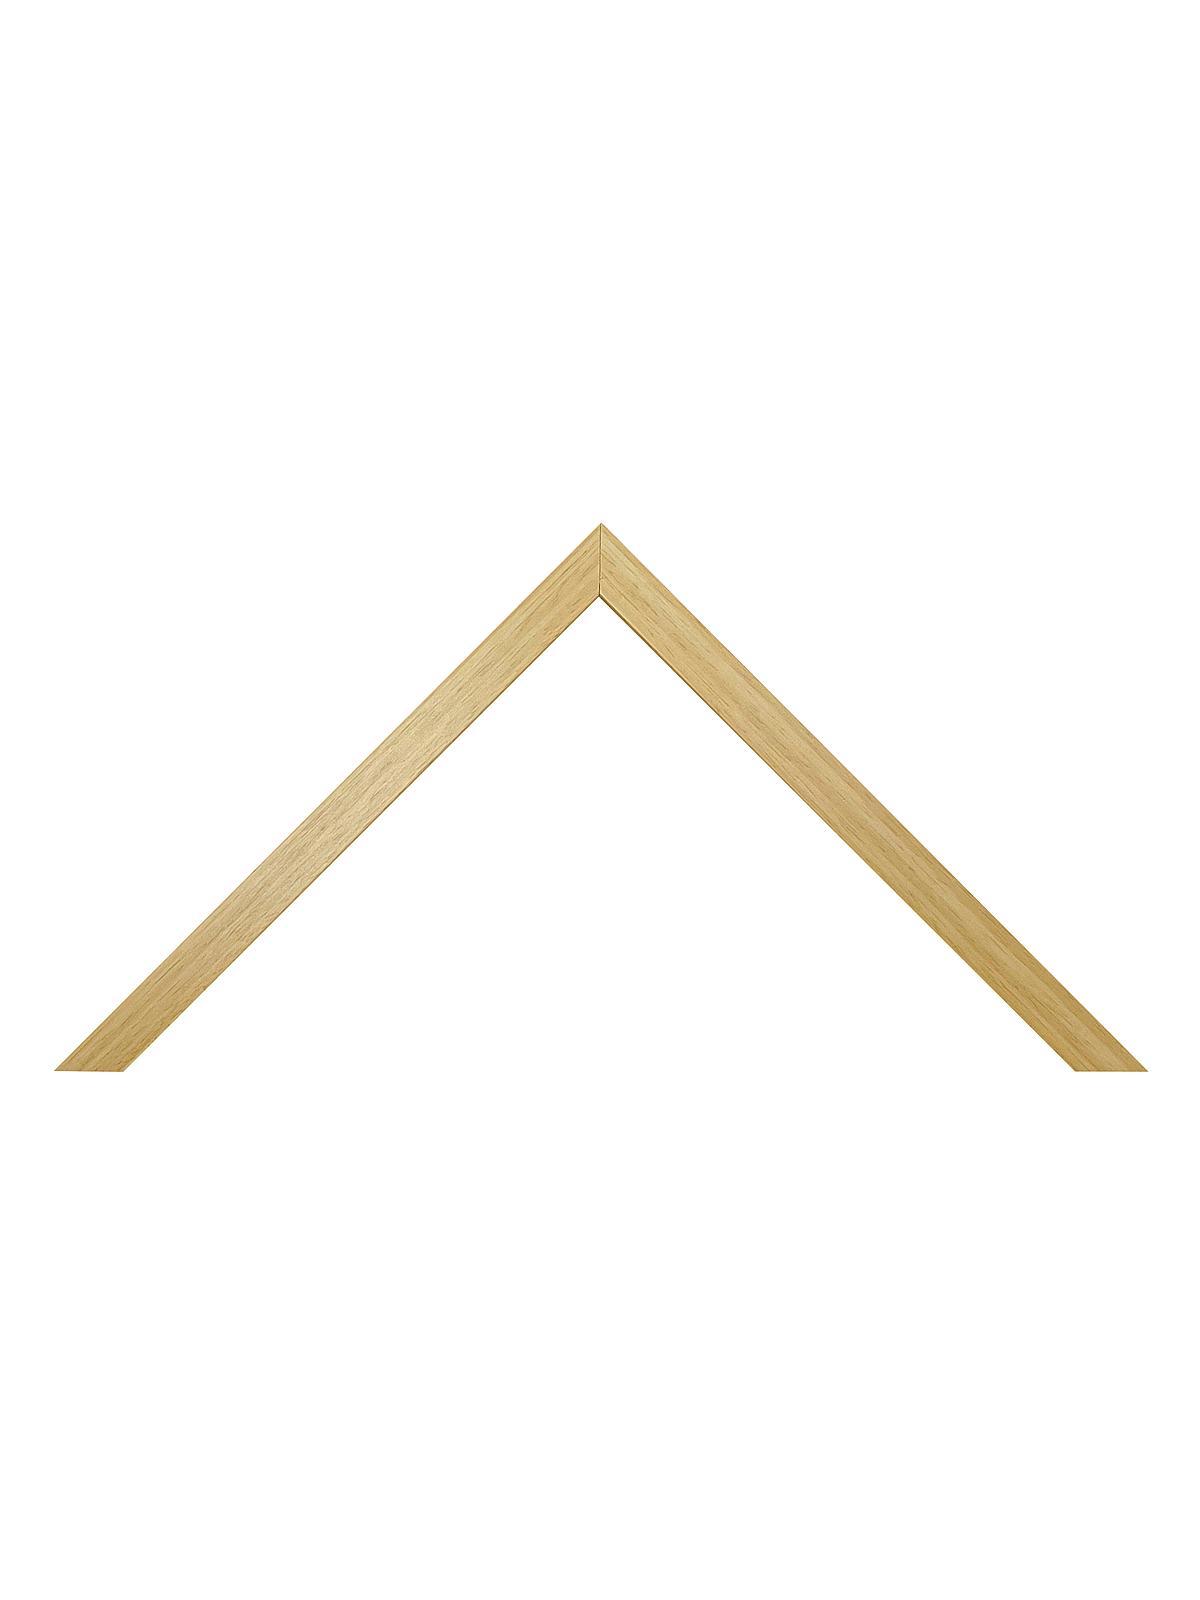 Nielsen Bainbridge Wood Frame Kits Misterart Com